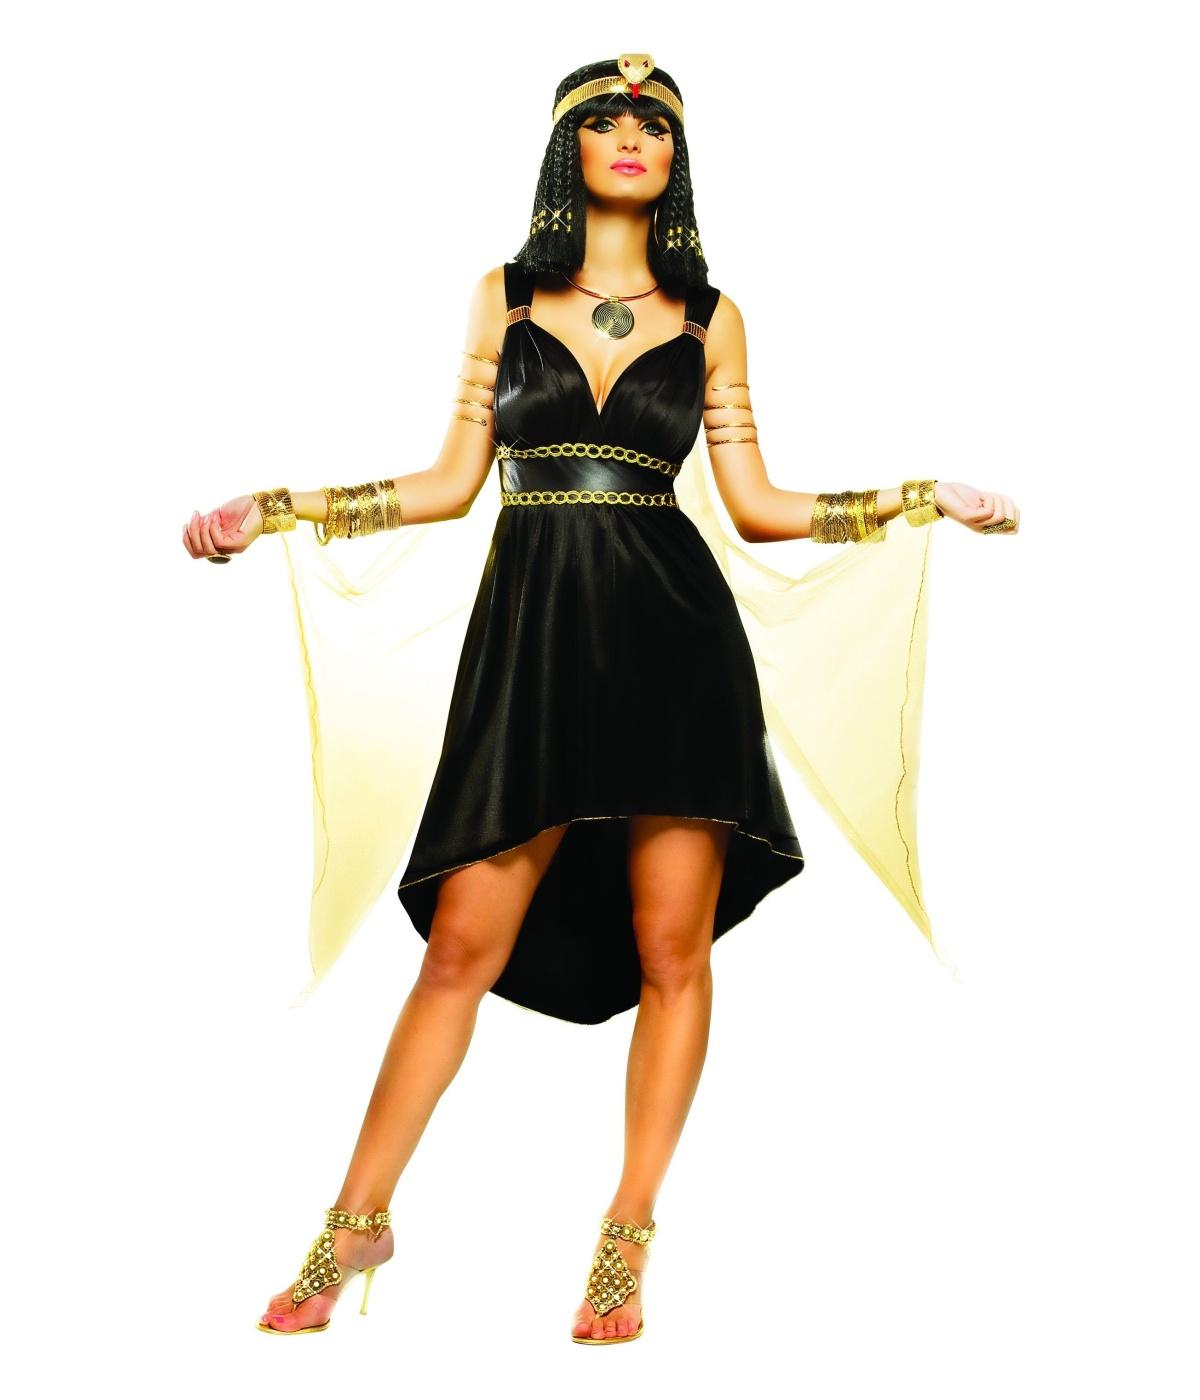 sc 1 st  Halloween Costumes & Cleopatra Egyptian Nile Princess Womens Costume - Egyptian Costumes